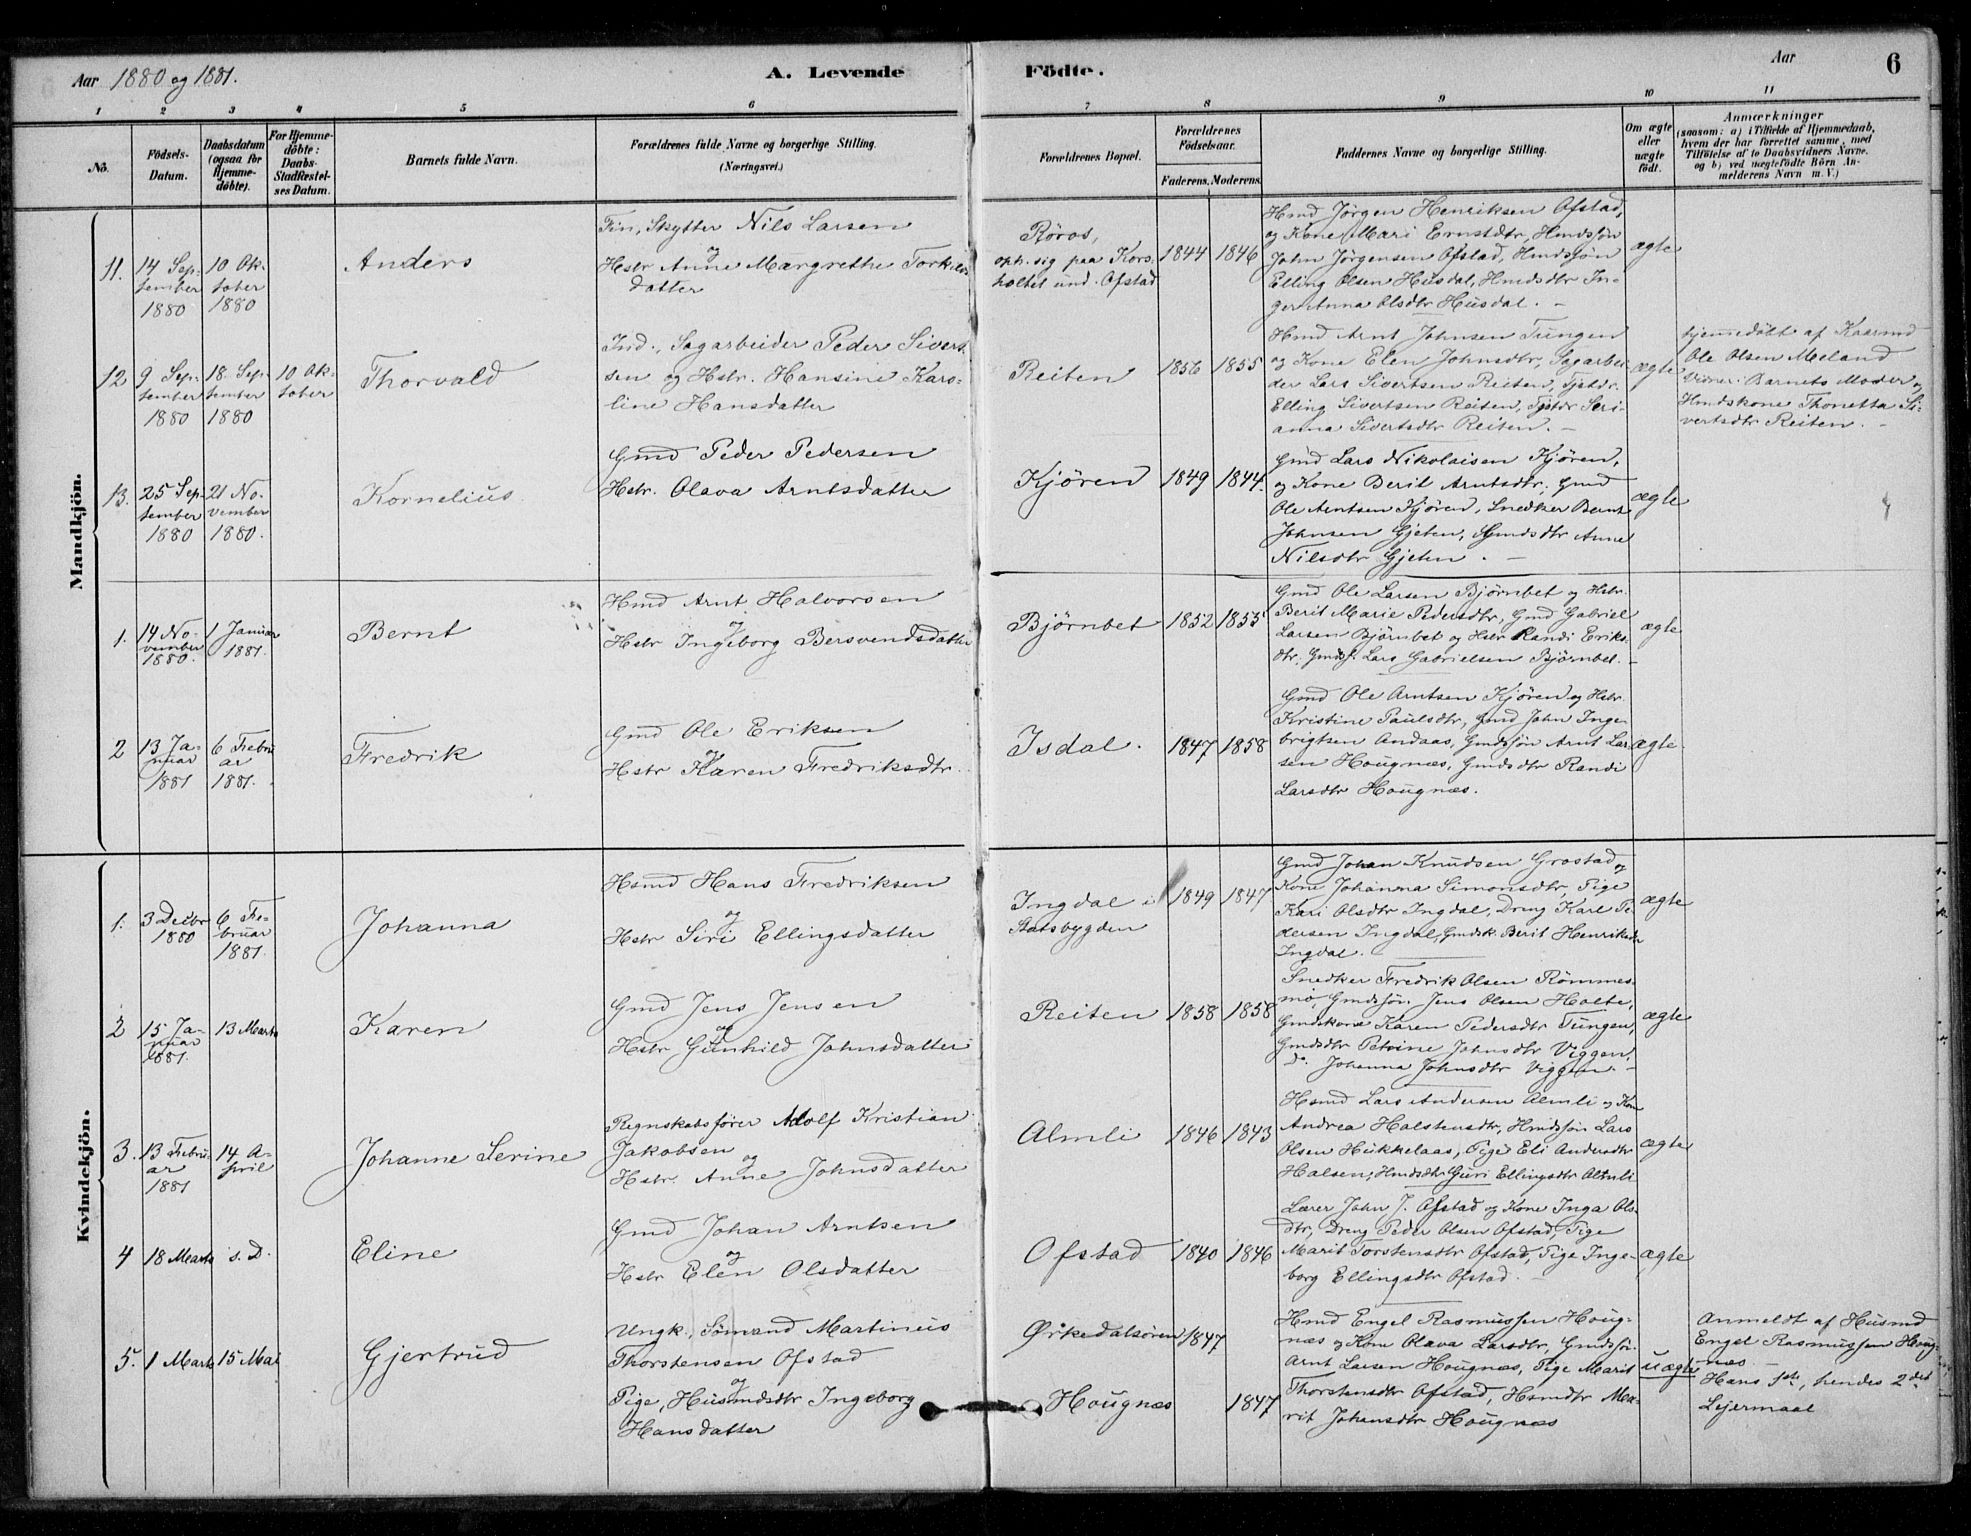 SAT, Ministerialprotokoller, klokkerbøker og fødselsregistre - Sør-Trøndelag, 670/L0836: Parish register (official) no. 670A01, 1879-1904, p. 6